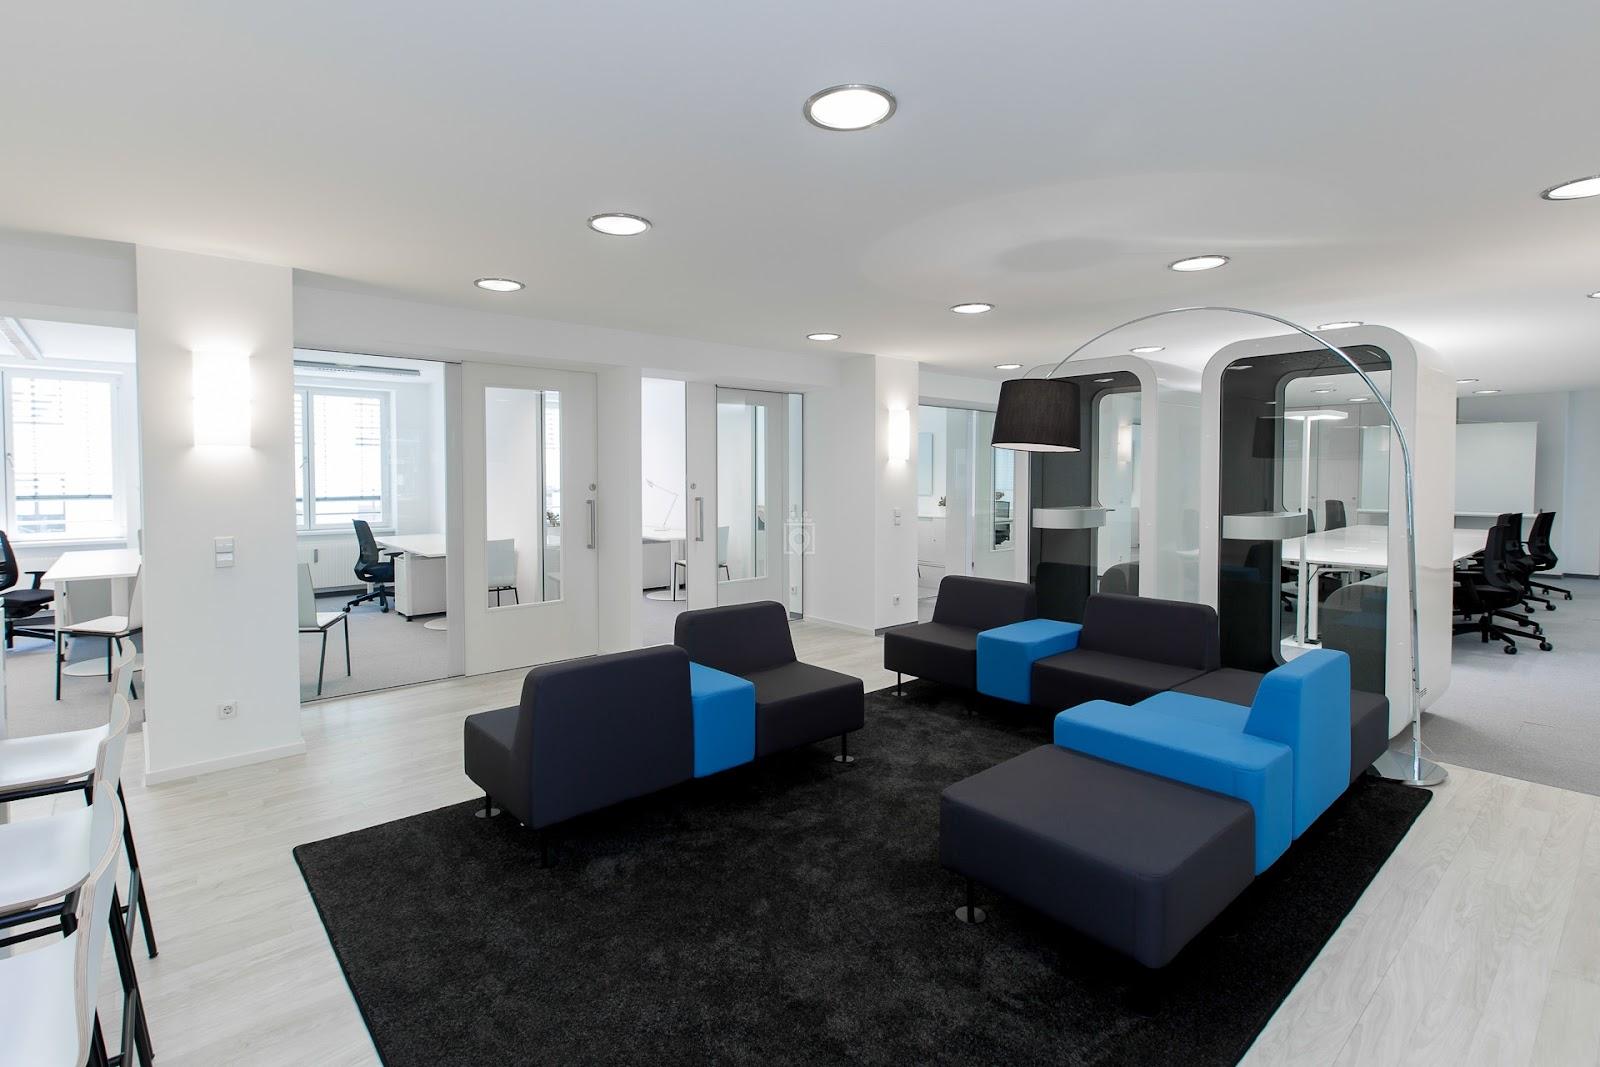 9 Best Coworking Space in Munich, Germany [2020 List] 17